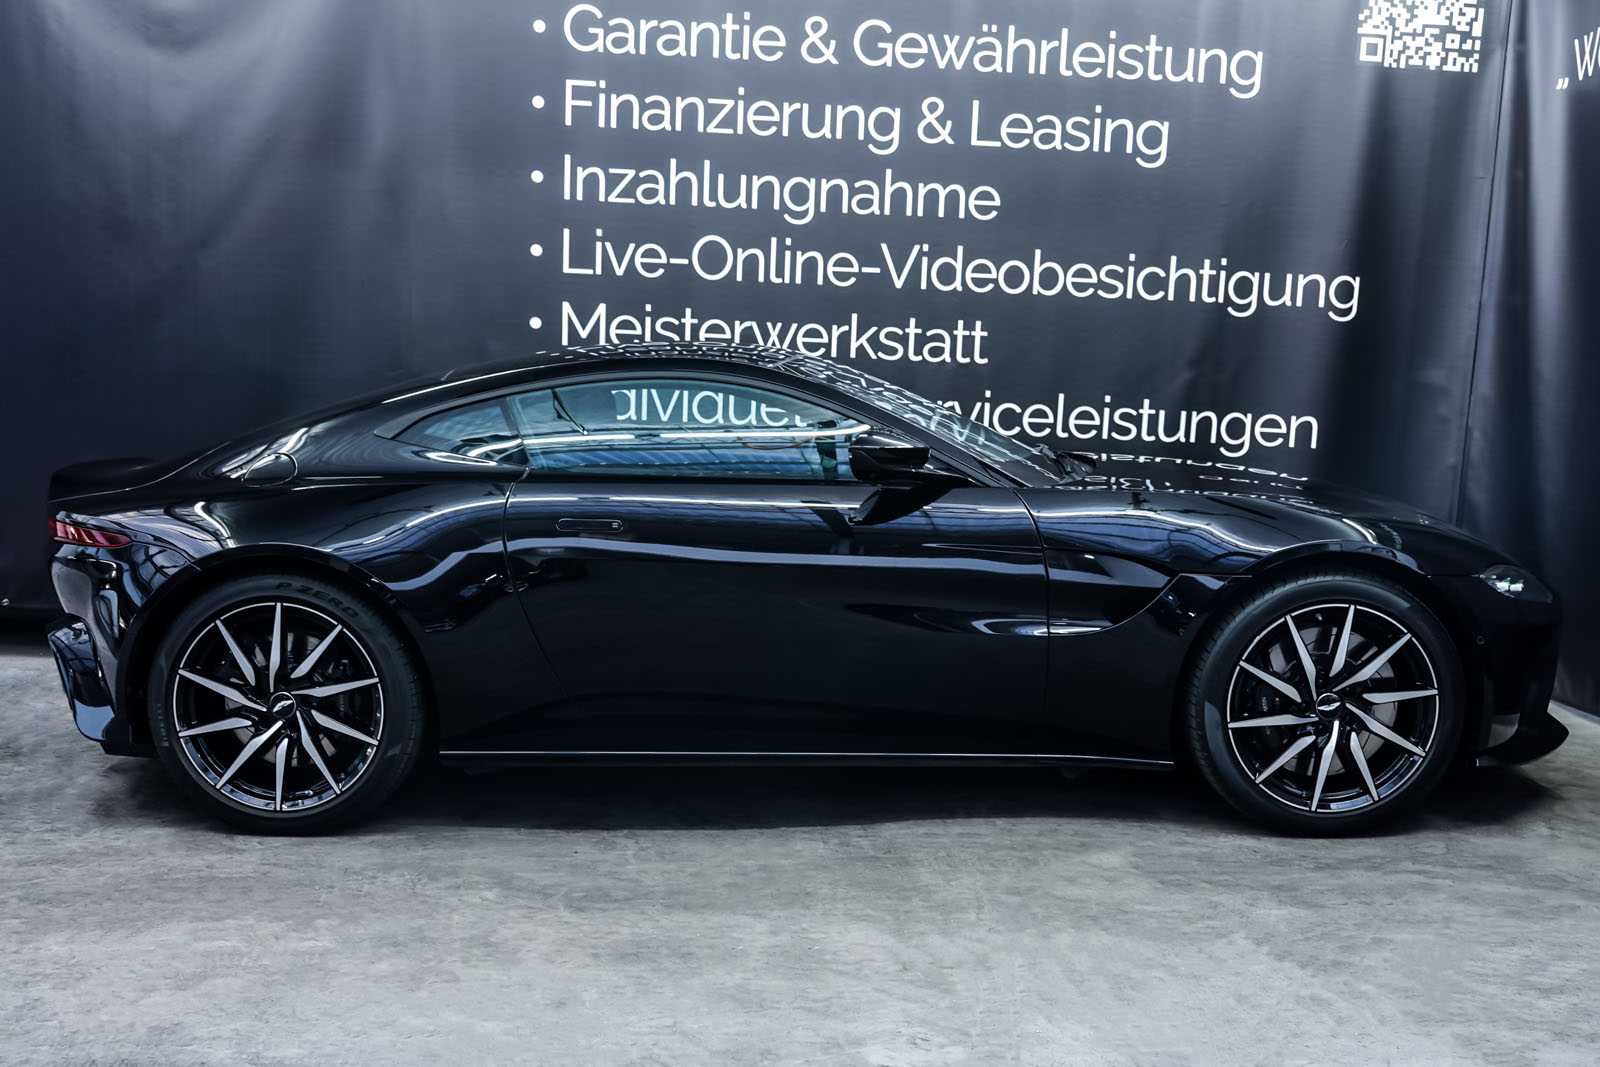 AstonMartin_V8_Vantage_Schwarz_Schwarz_AM-1849_14_w